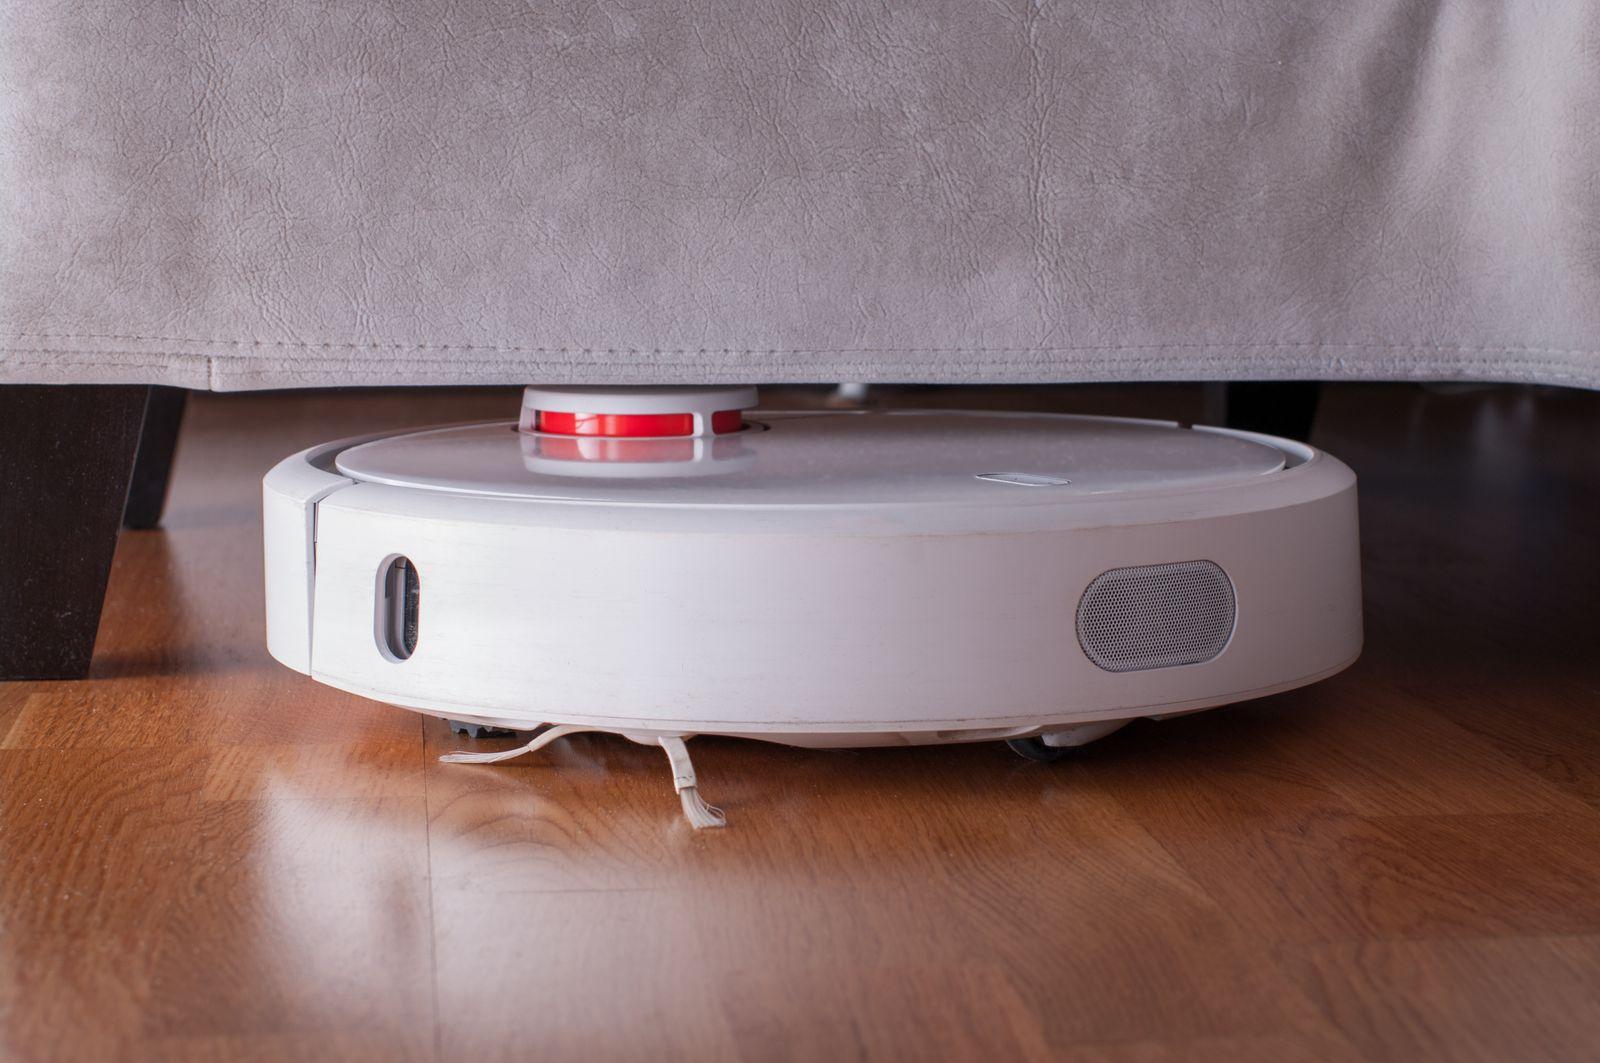 Close-Up Of Robotic Vacuum Cleaner On Hardwood Floor